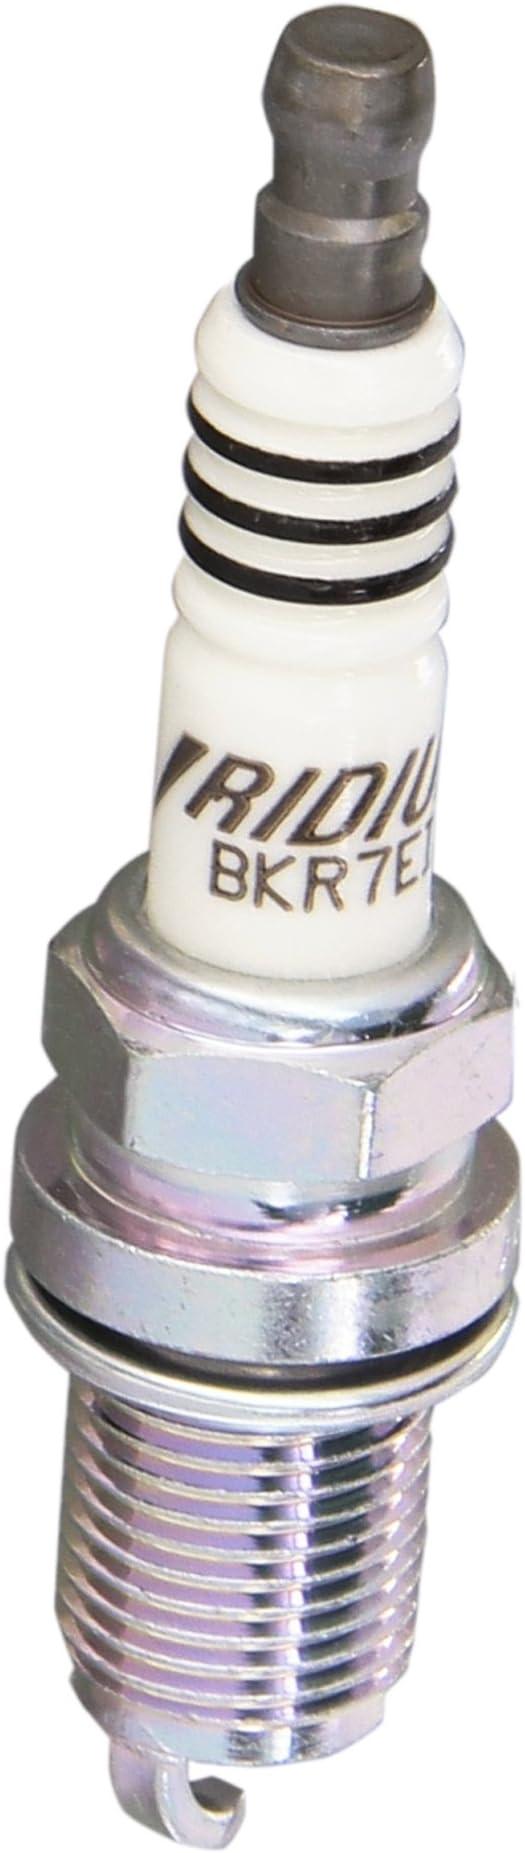 NGK 2667 BKR7EIX Iridium IX Spark Plug